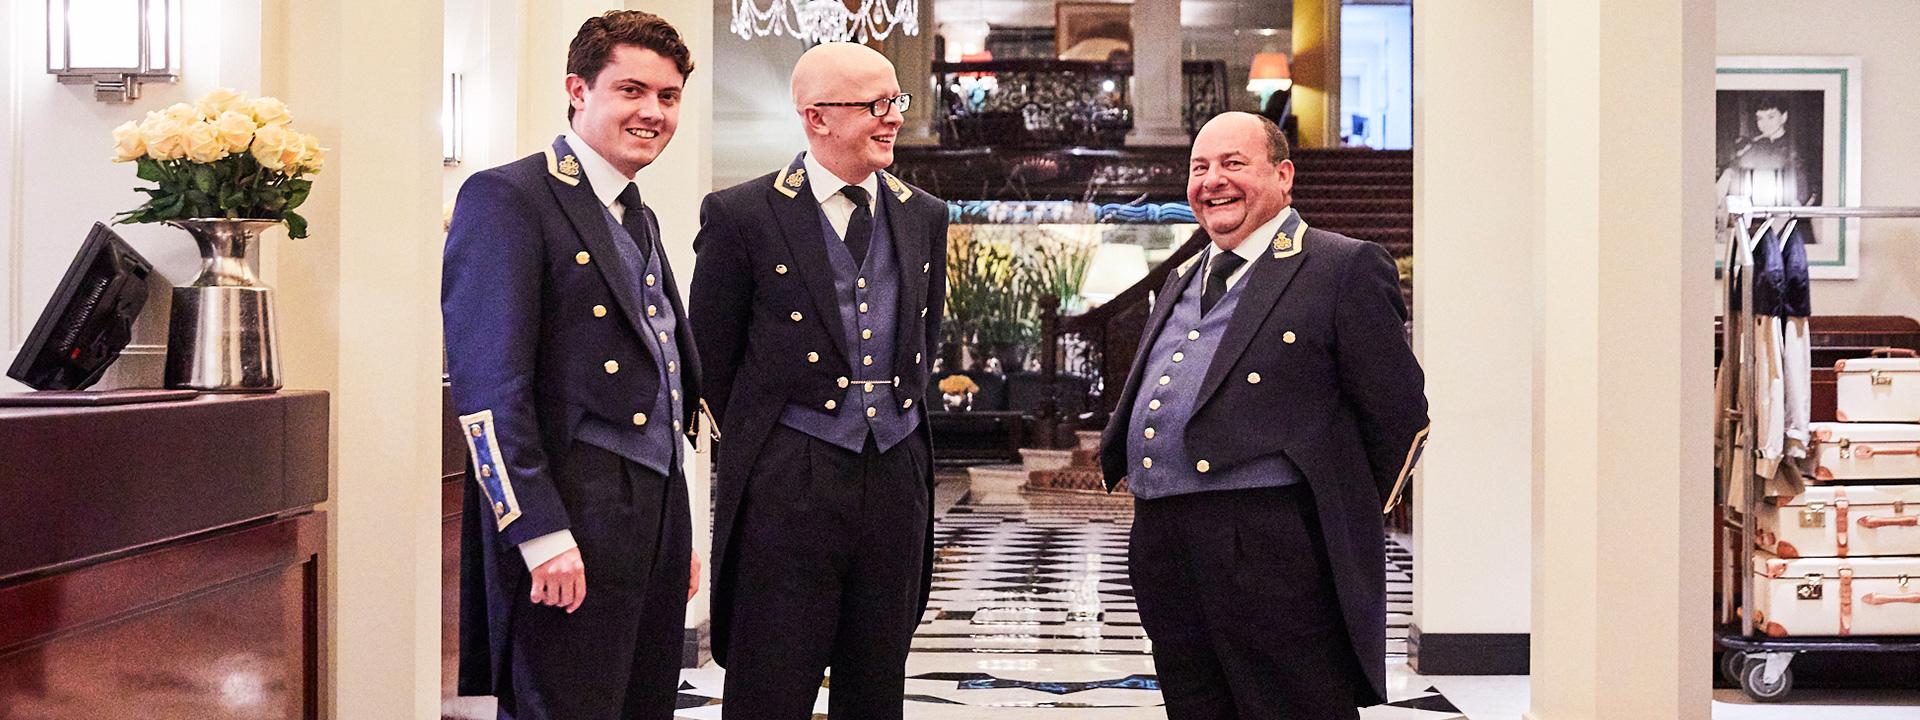 A Royally Good Concierge hero